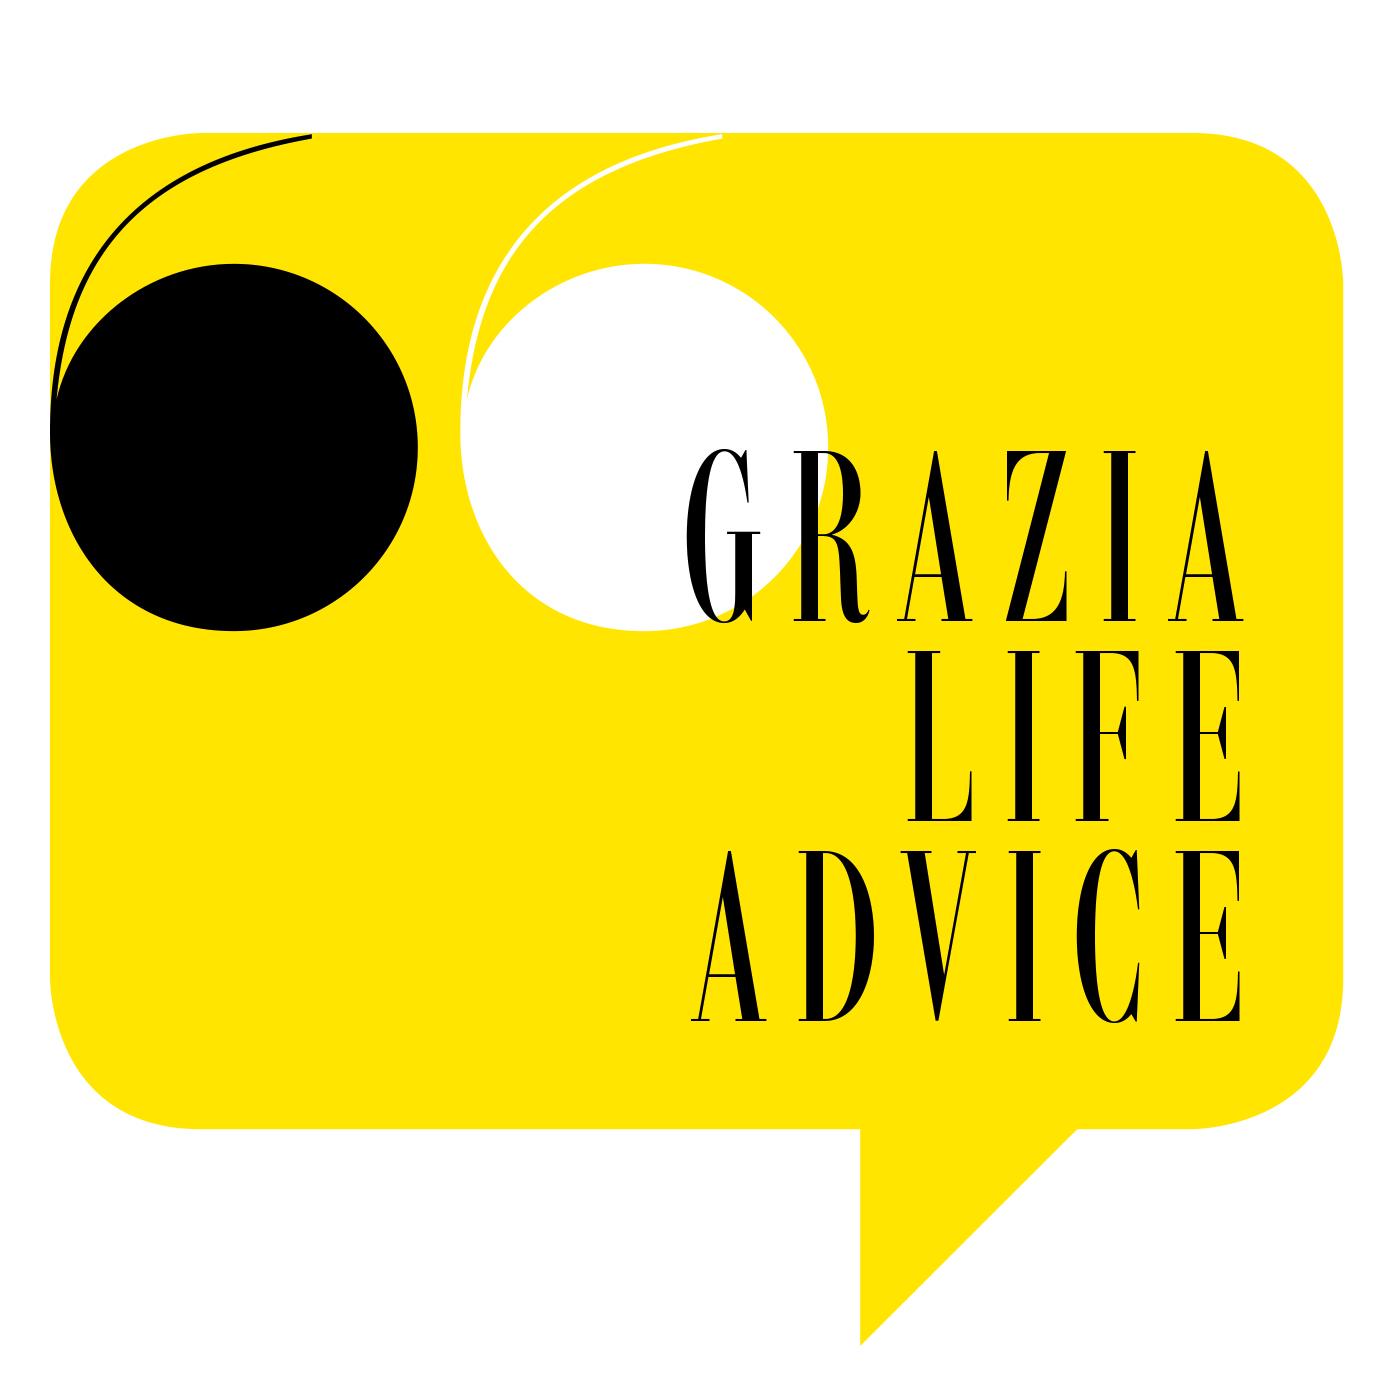 Grazia Life Advice - Podcast Episodes | Listen Now on ...  Grazia Life Adv...